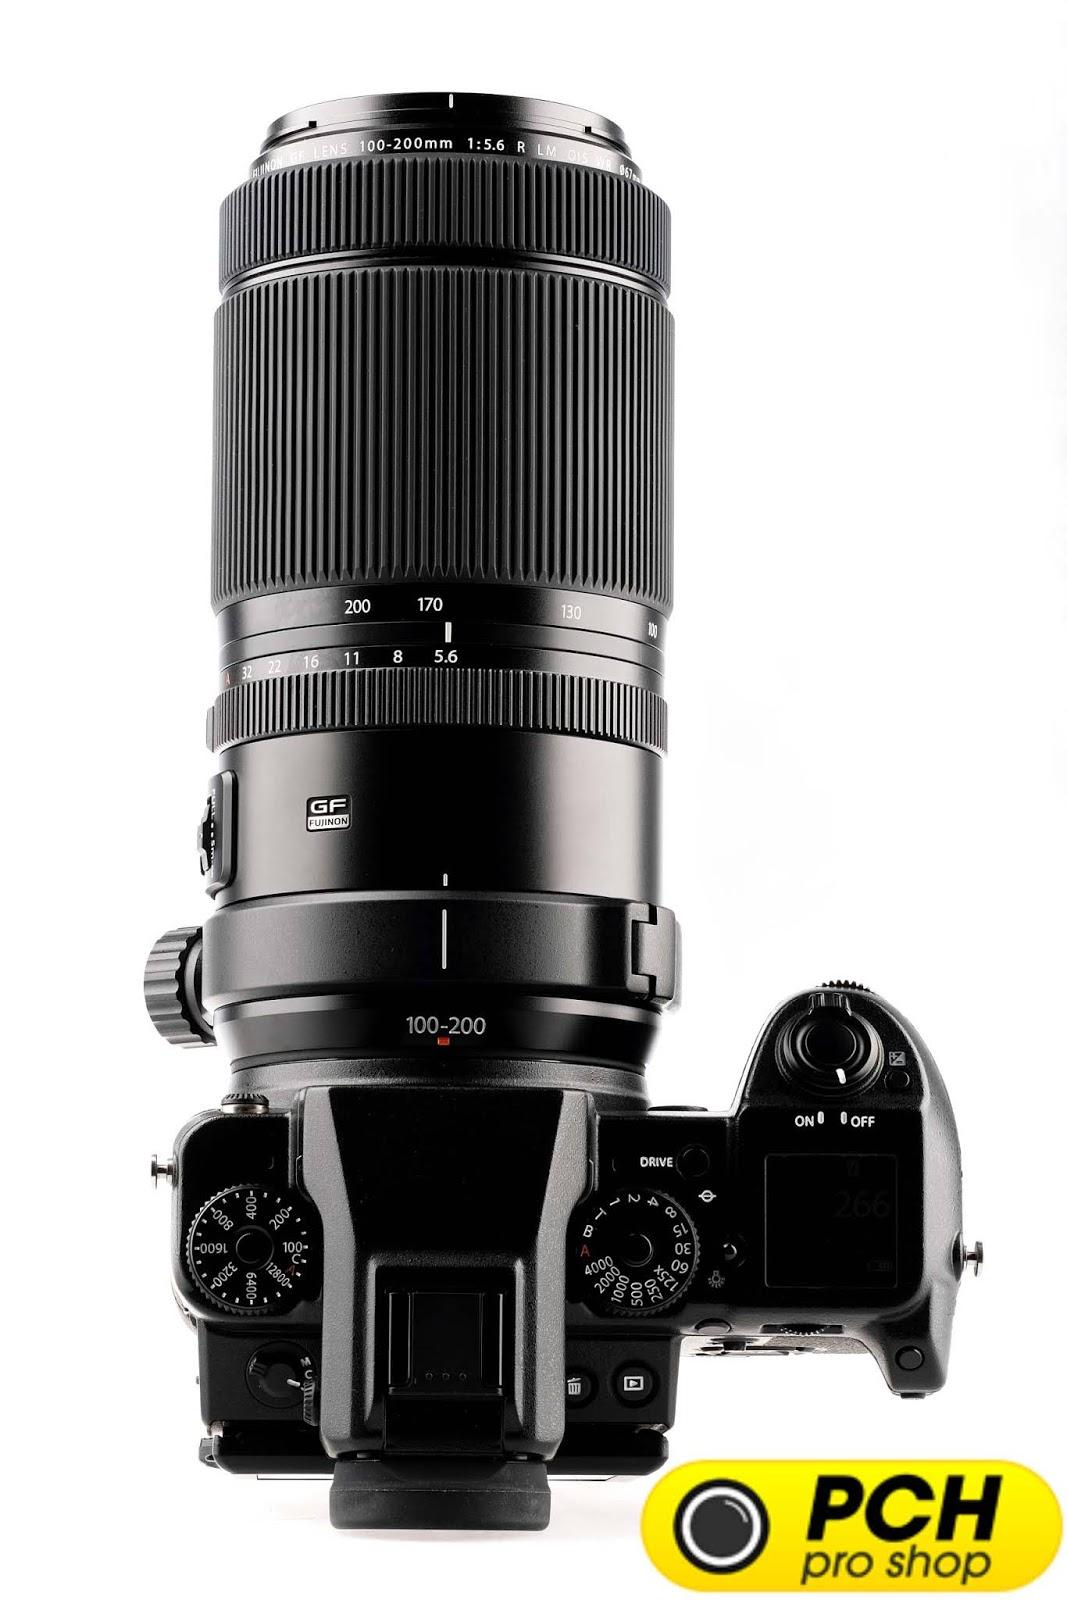 Объектив Fujinon GF 100-200mm f/5.6 R LM OIS WR с камерой Fujifilm GFX 50S, вид сверху